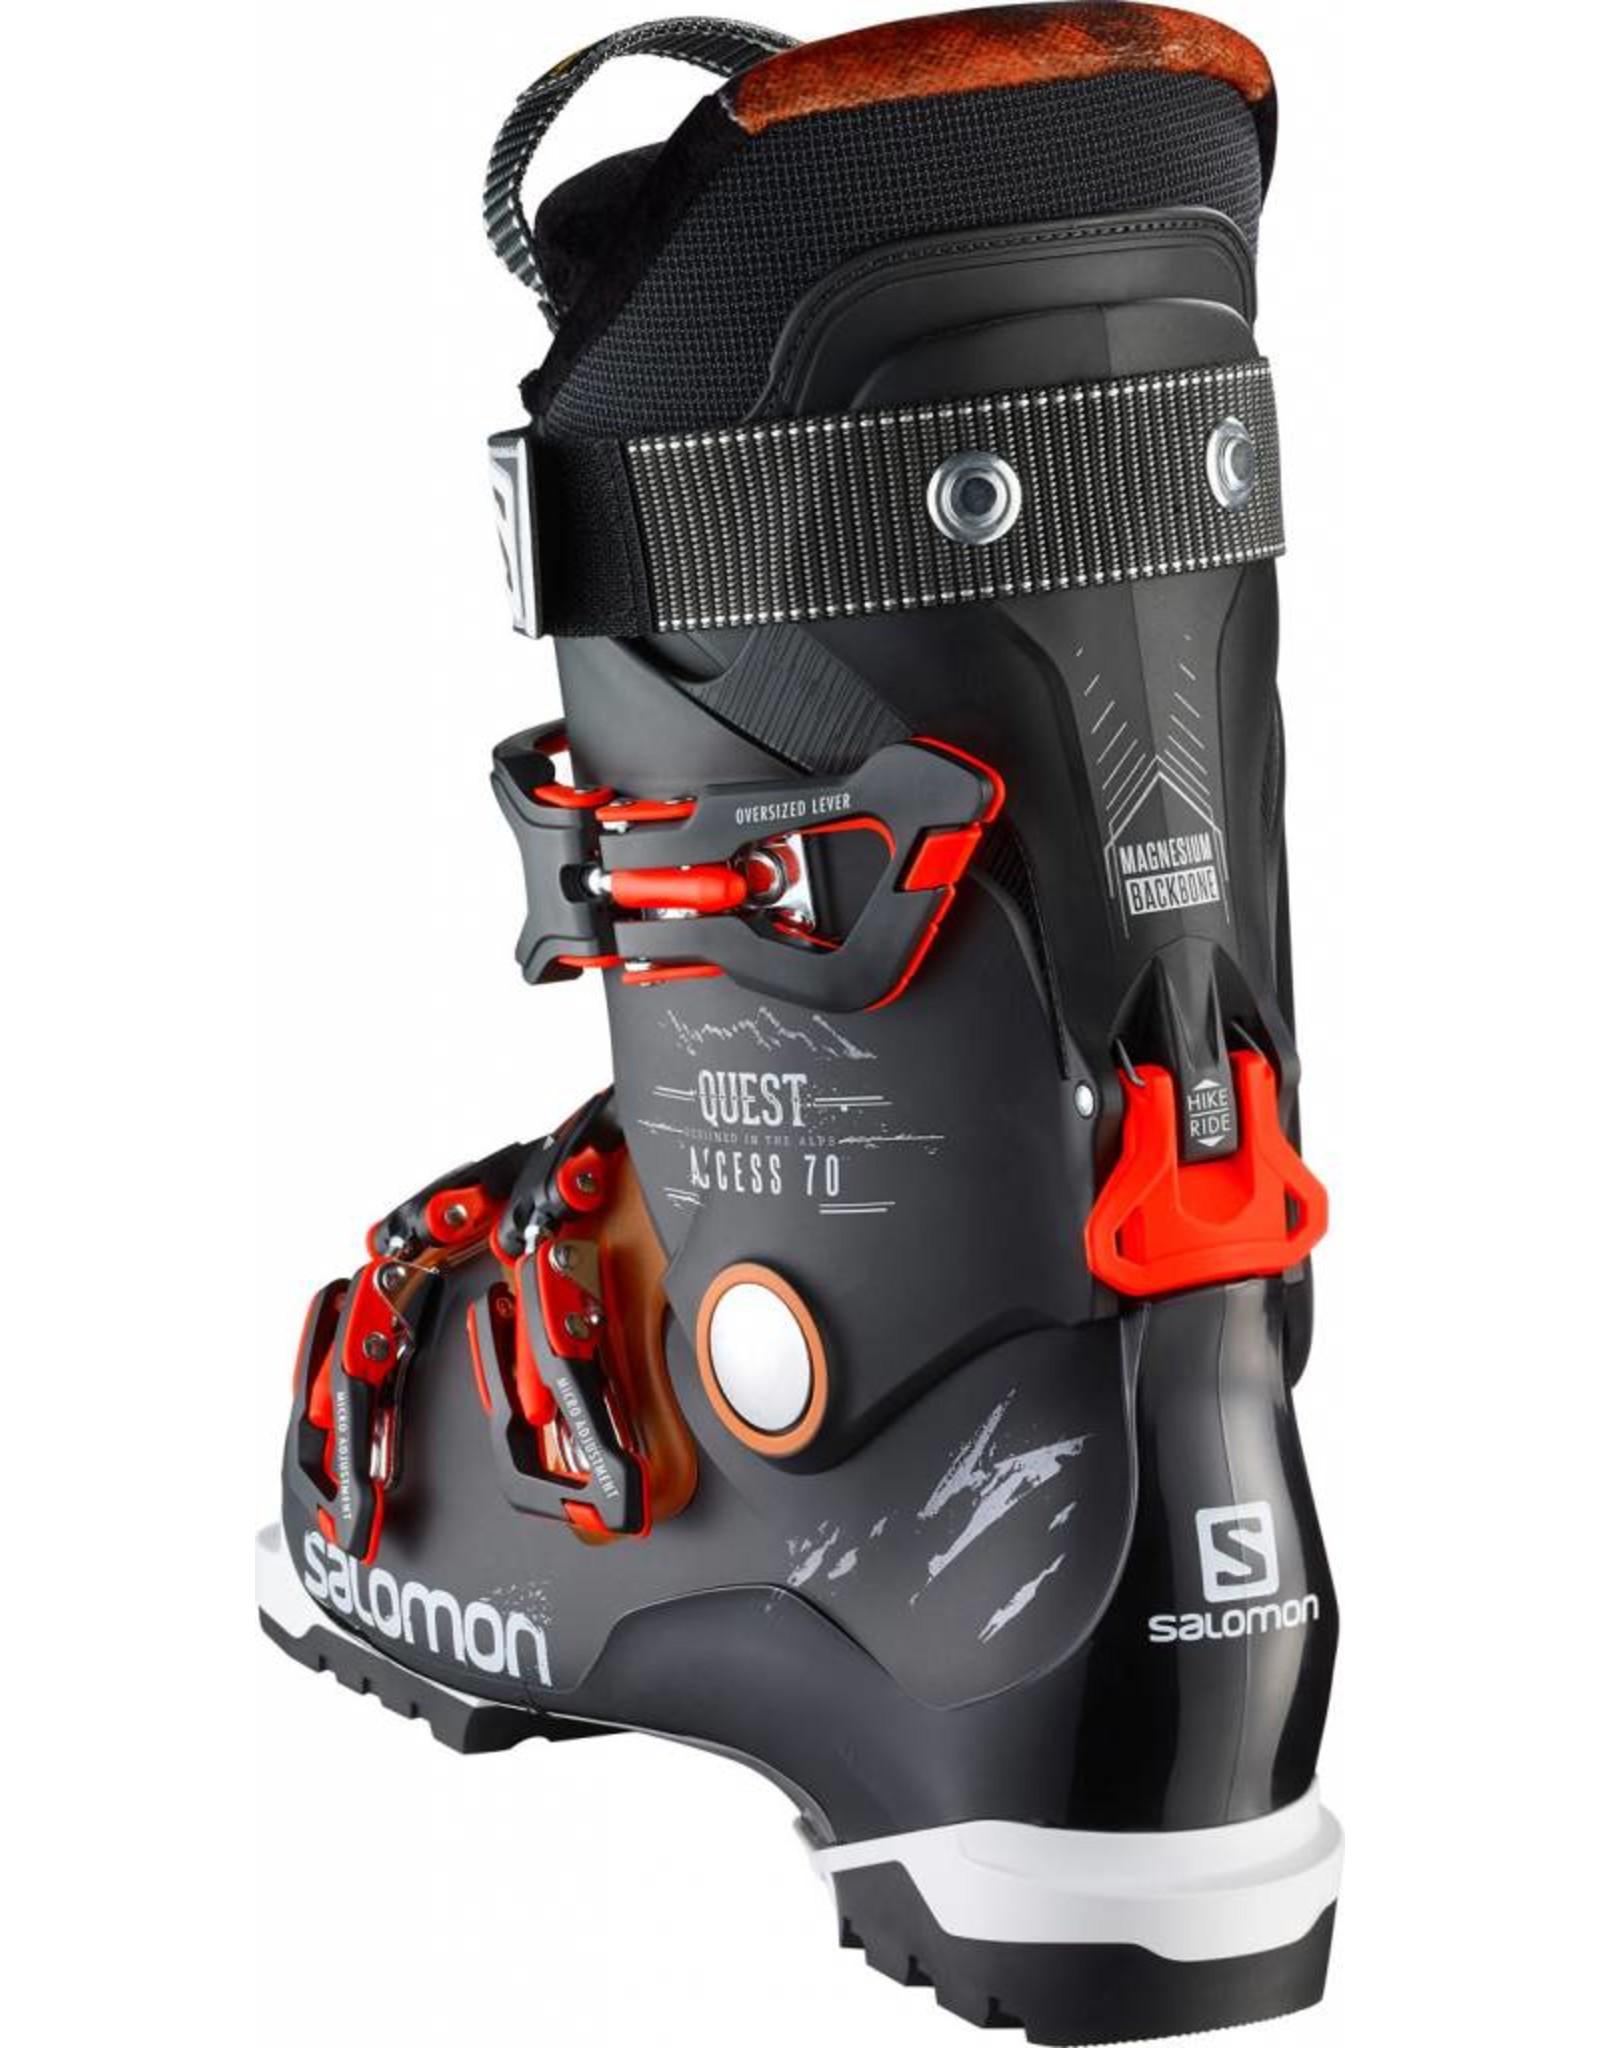 Salomon Salomon Quest Access70 Men's Boot